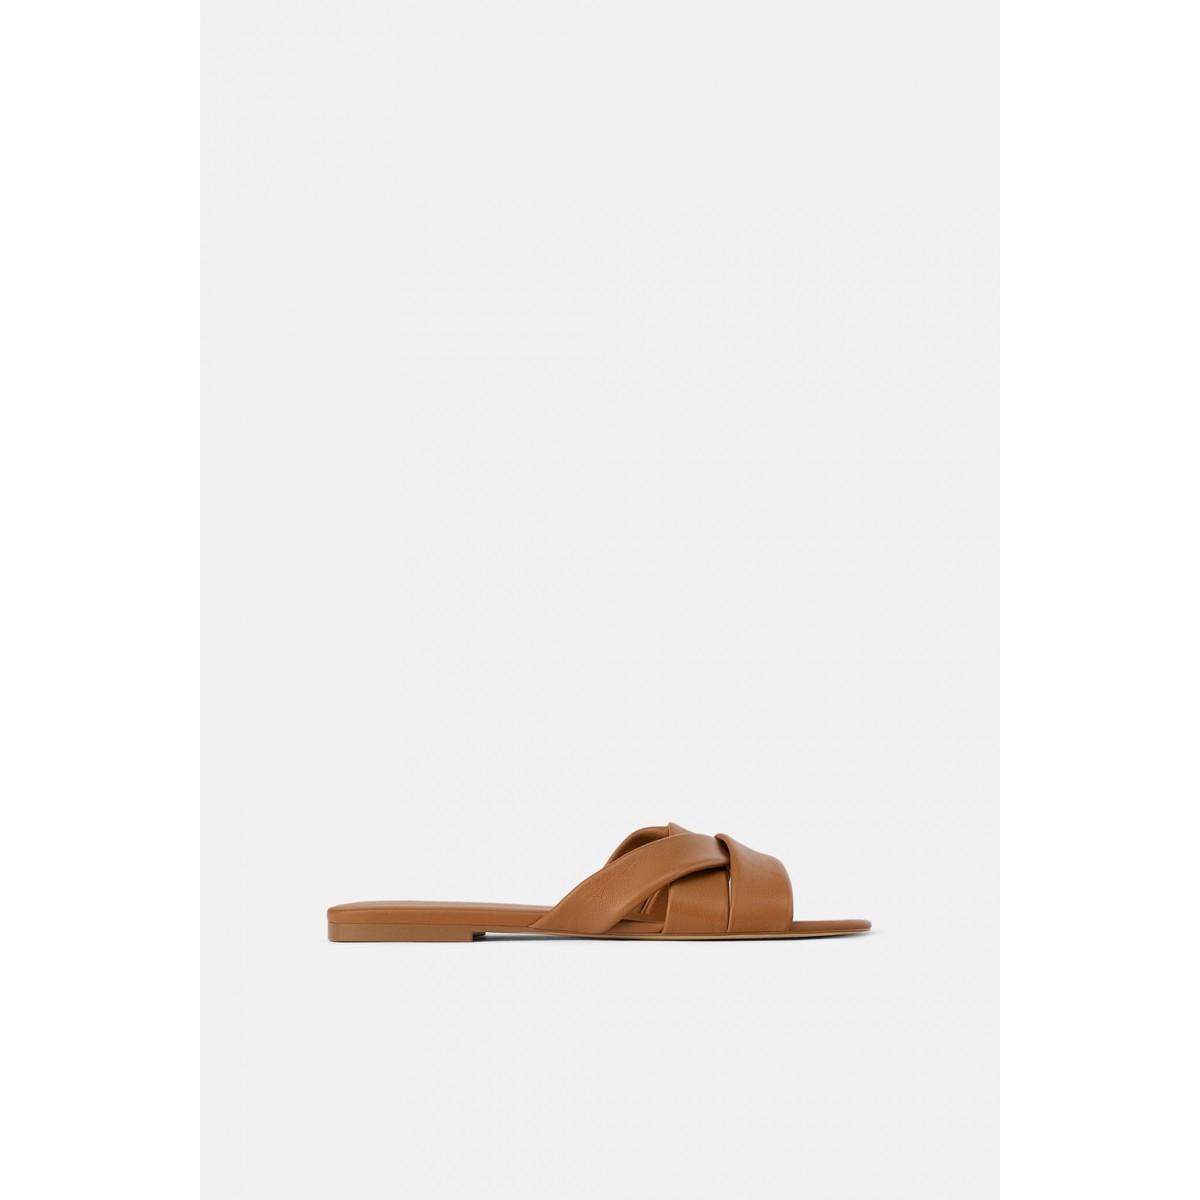 Zara Flat Leather Sandals With CrissCross